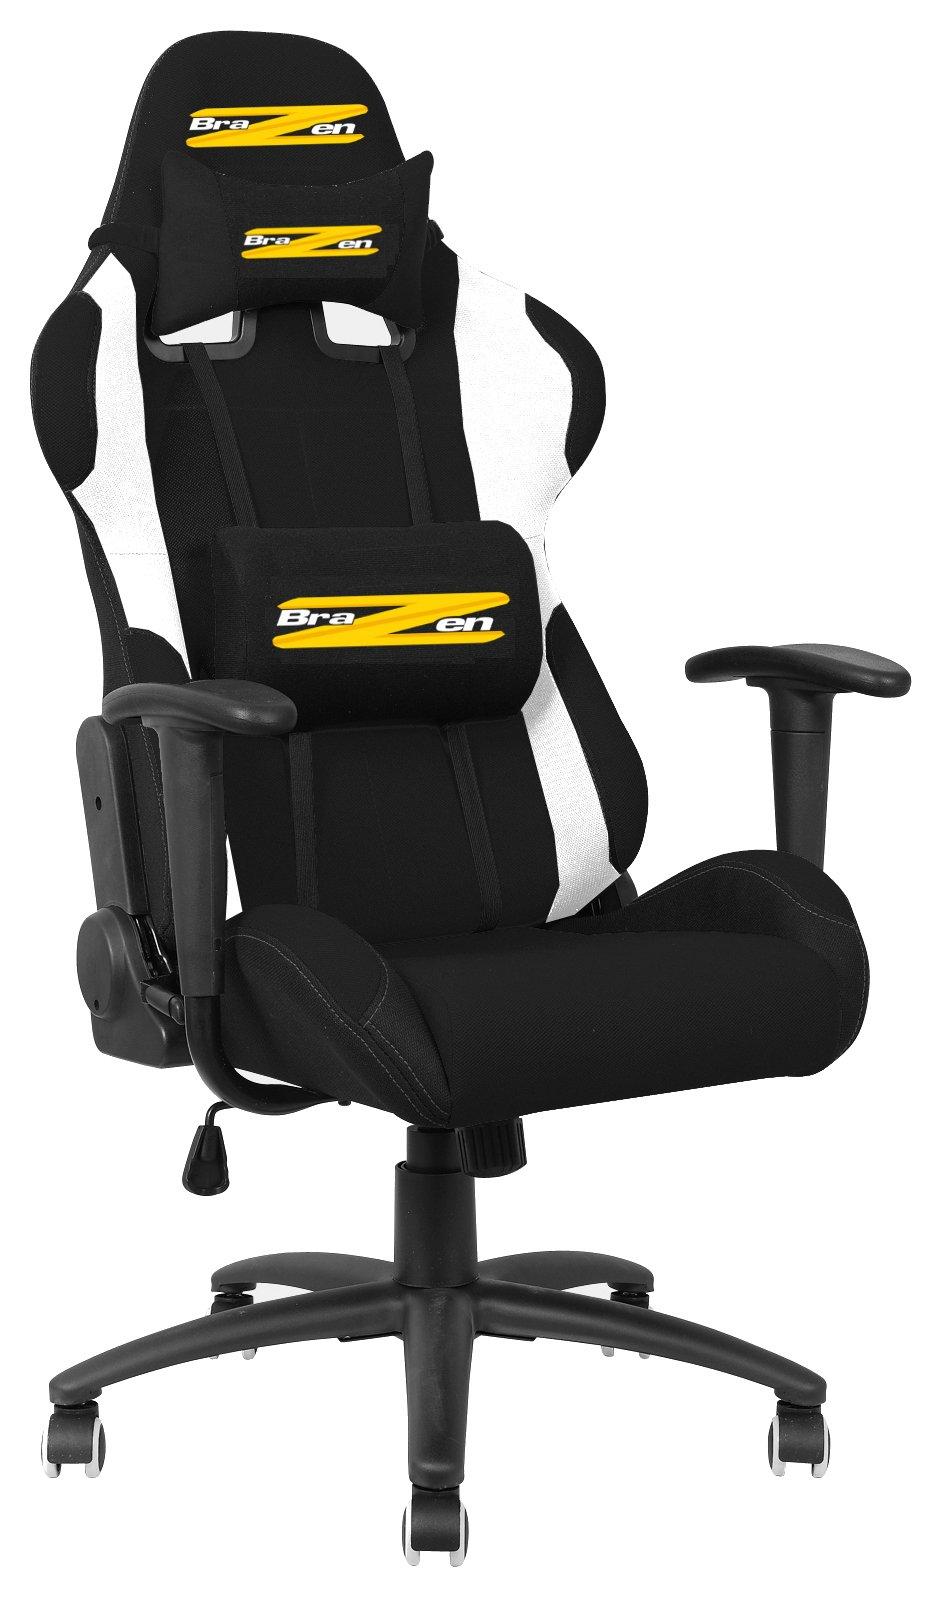 Interactive Minds Brazen Shadow Pro Gaming Chair - Black.